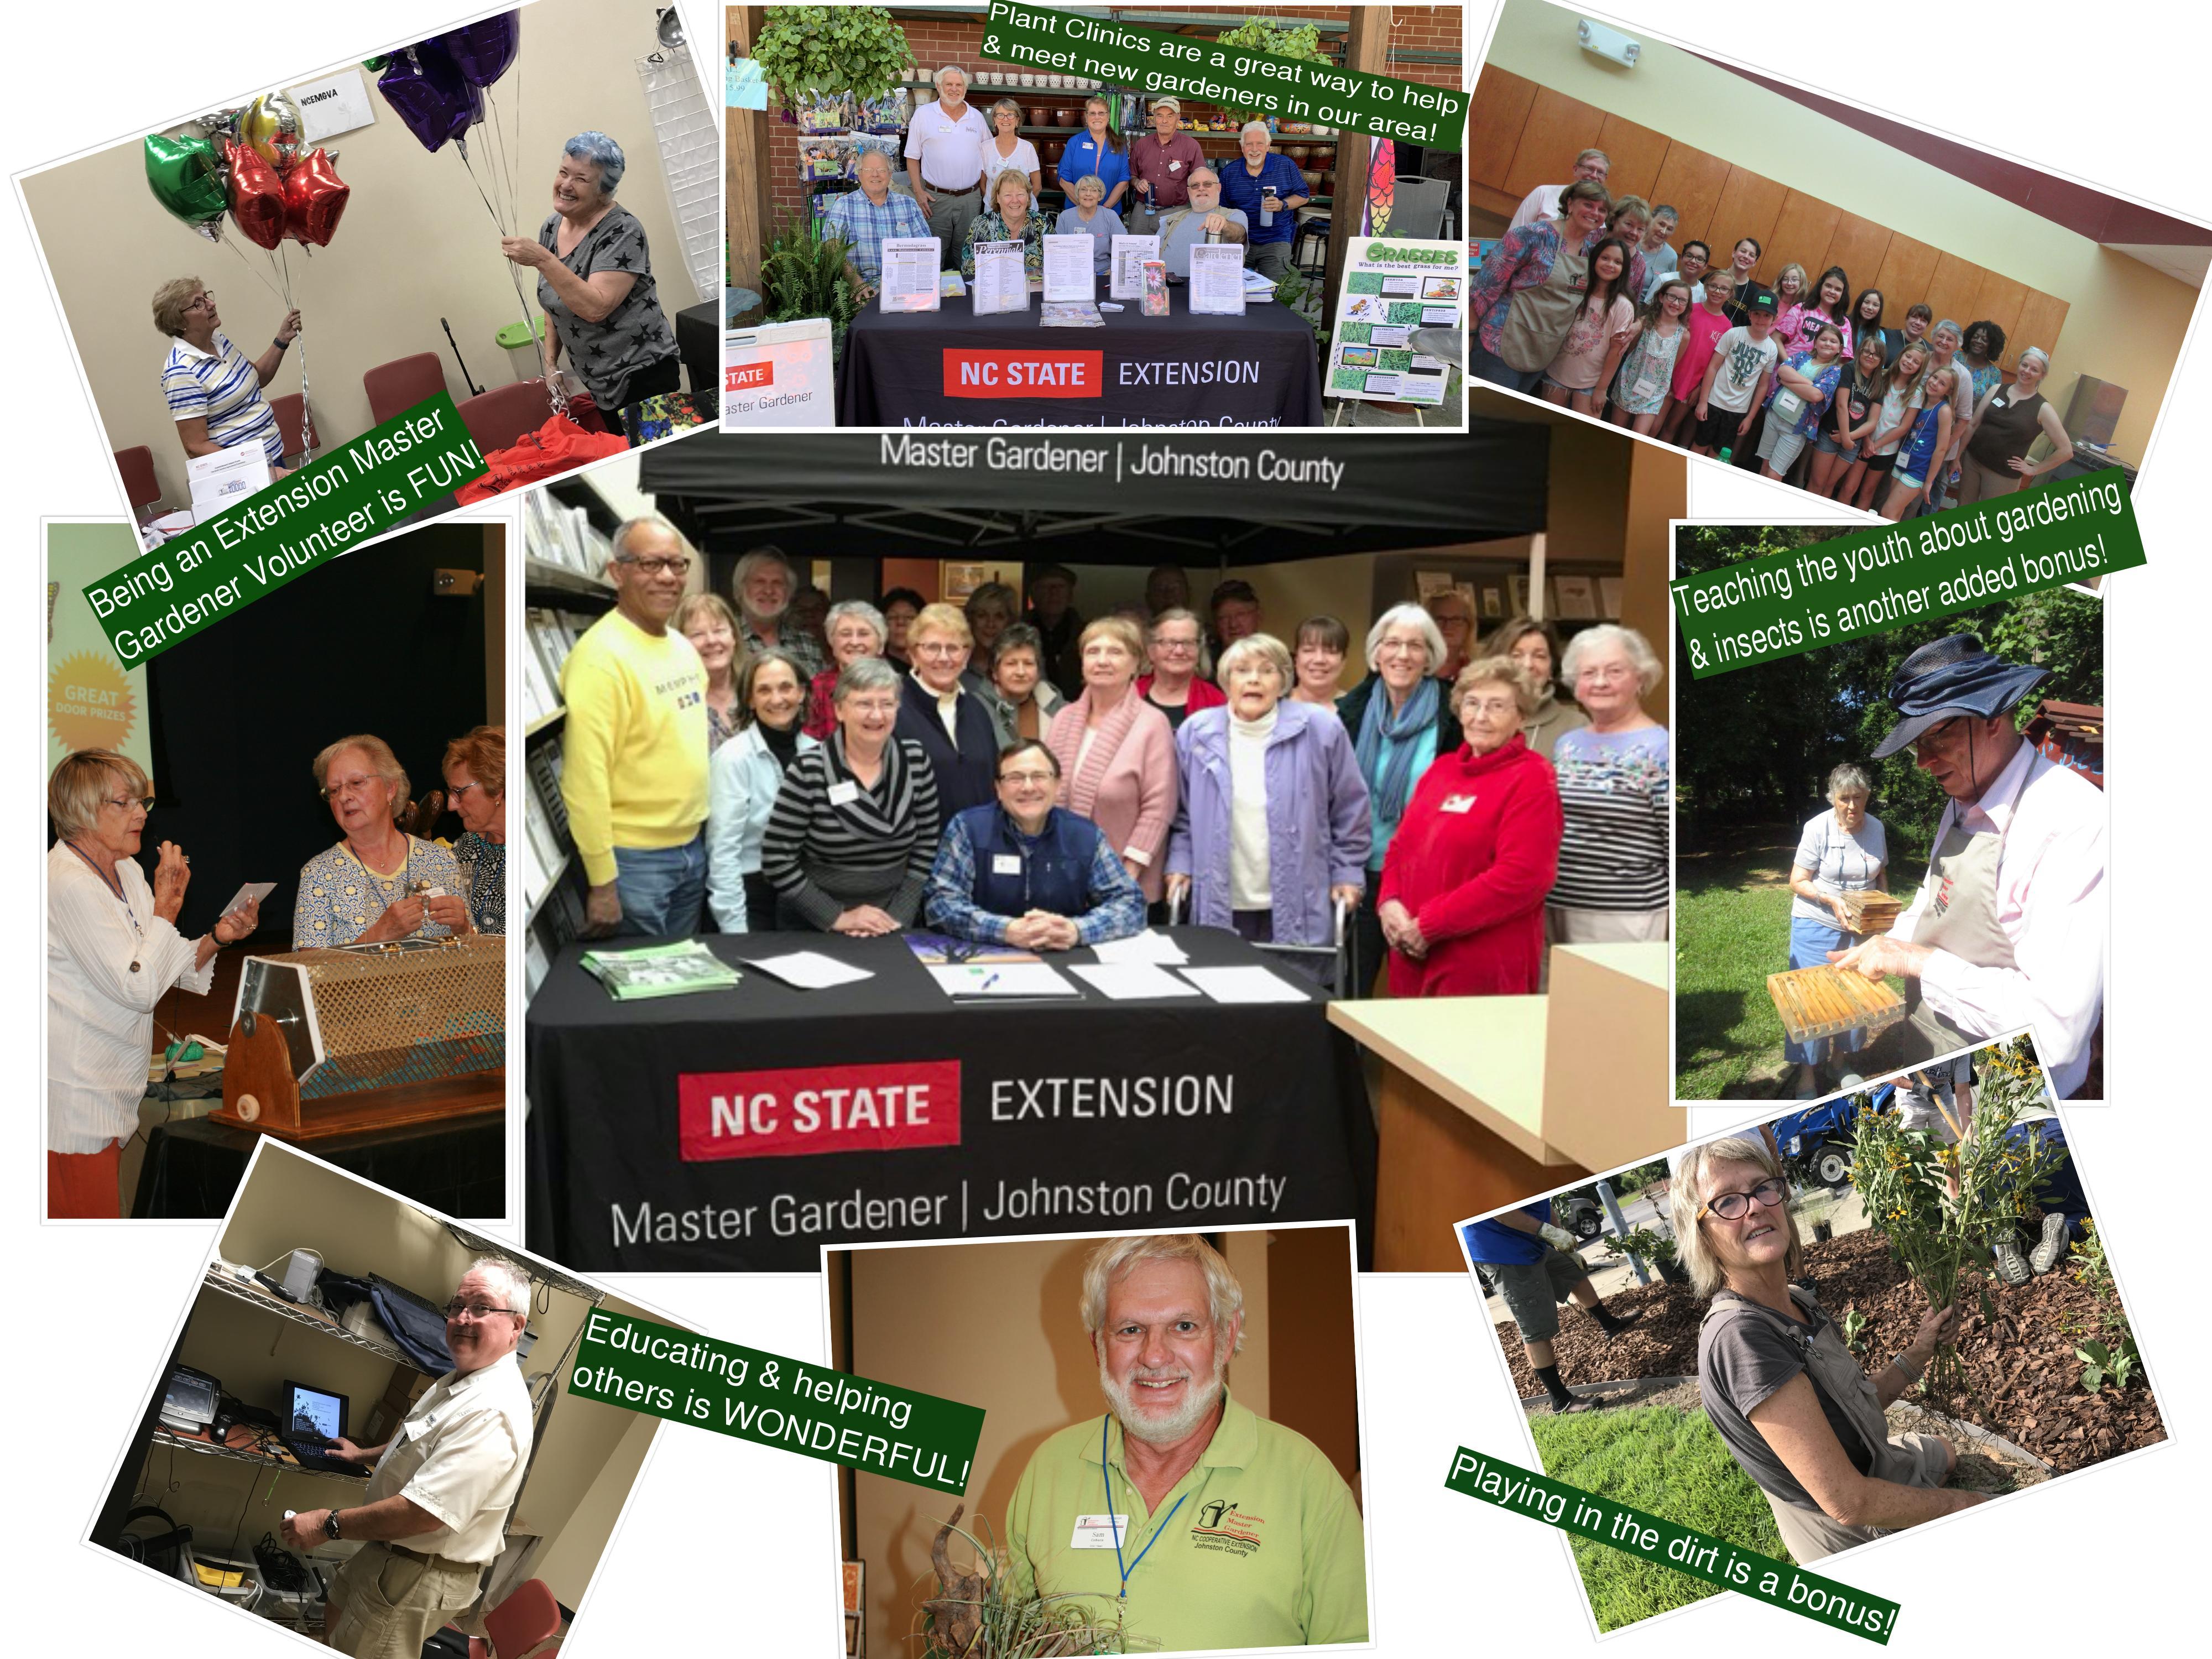 Collage of Master Gardener Volunteers from Johnston County